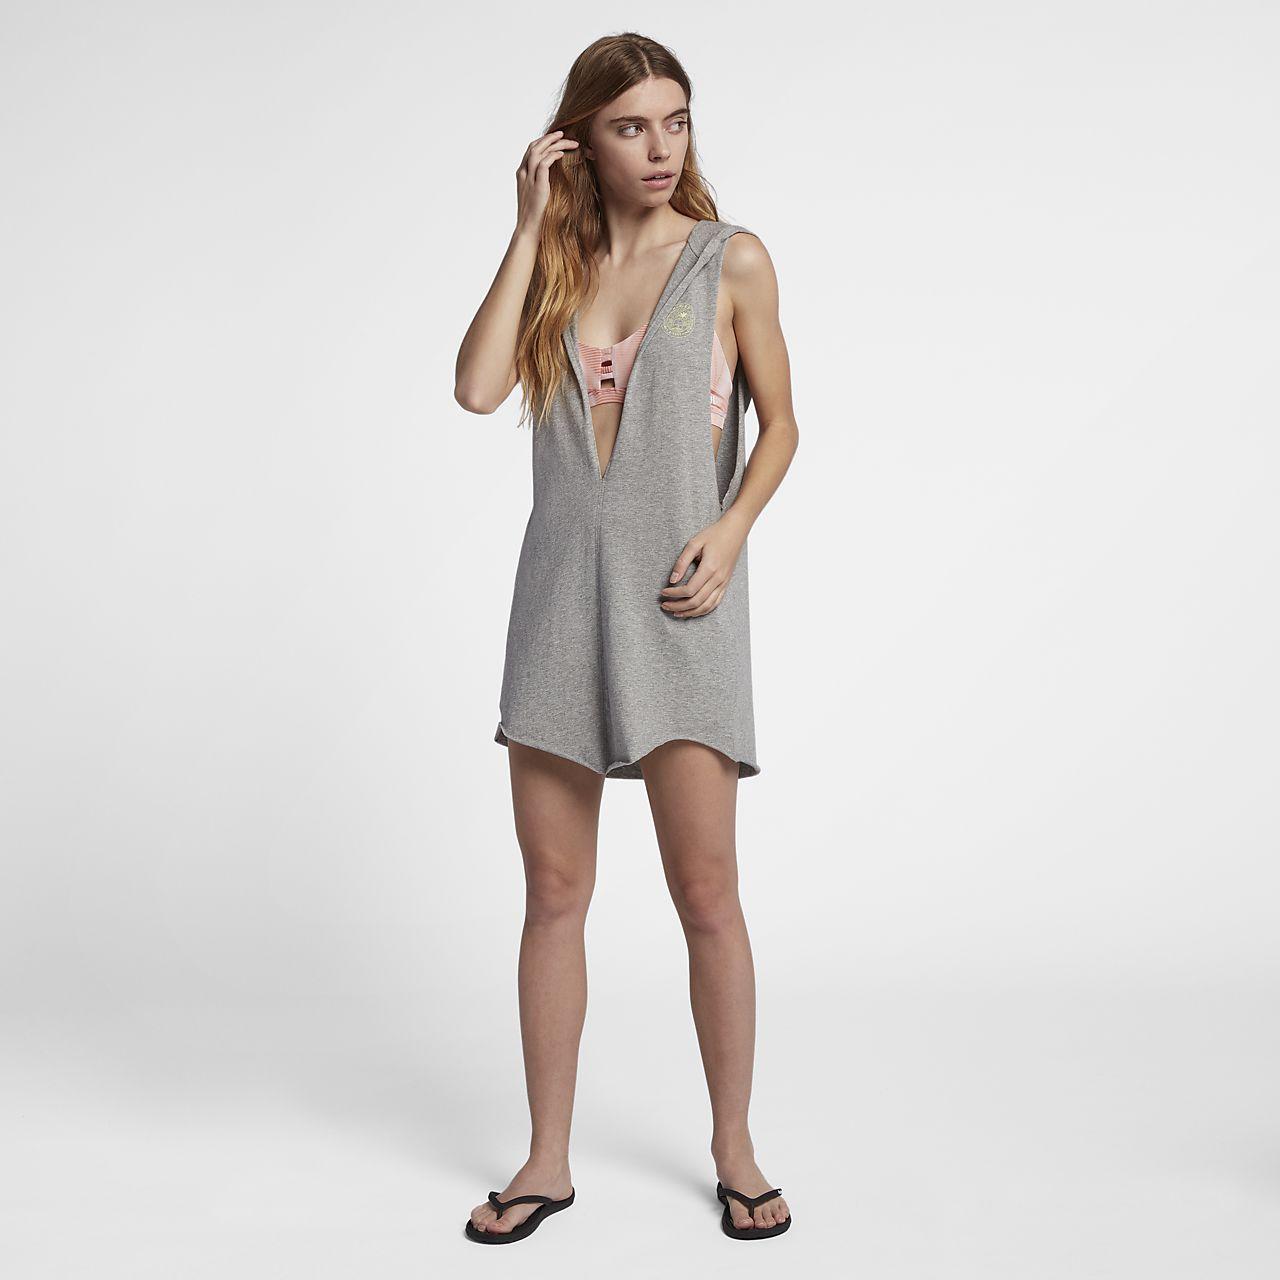 ... Hurley Good Times Women's Dress